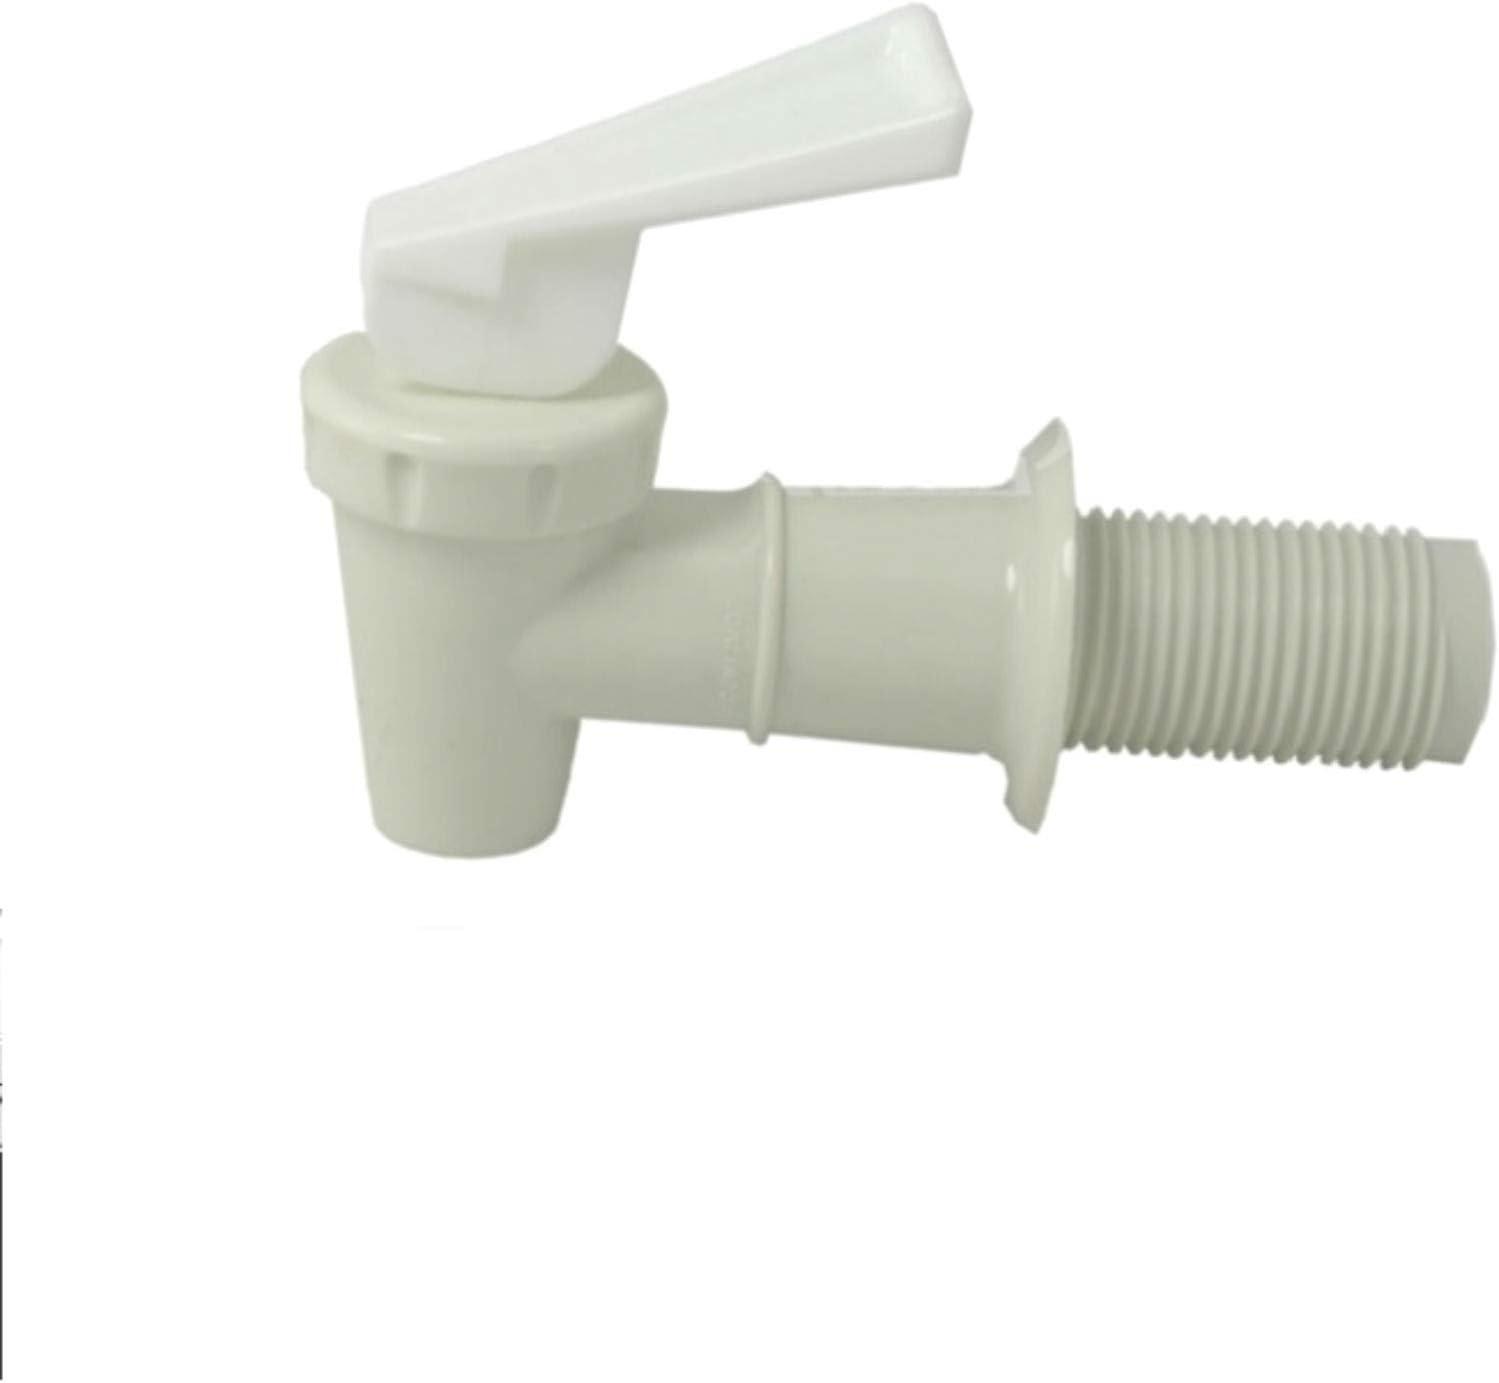 Plástico Agua Grifo dispensador de bebida espiga de ~ ~ ~ cacerola ~ hecho para alimentación por gravedad ~ sin BPA ~ Made in the USA ~ 3/4 Inch: Amazon.es: Hogar